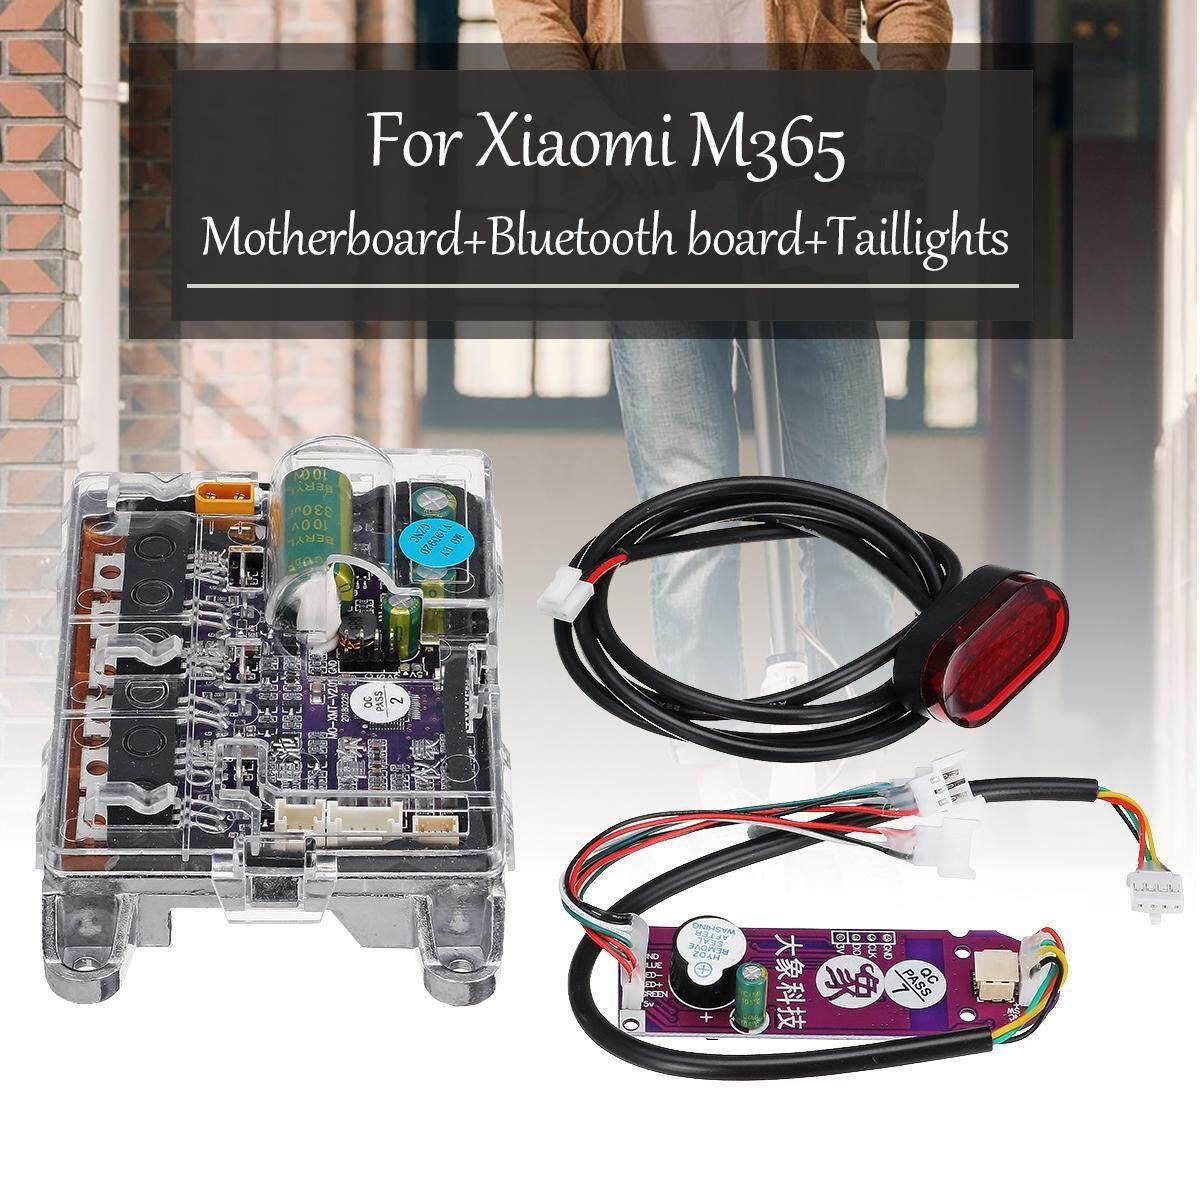 Generic For Xiao-mi M365 Circuit Motherboard+bluetooth board